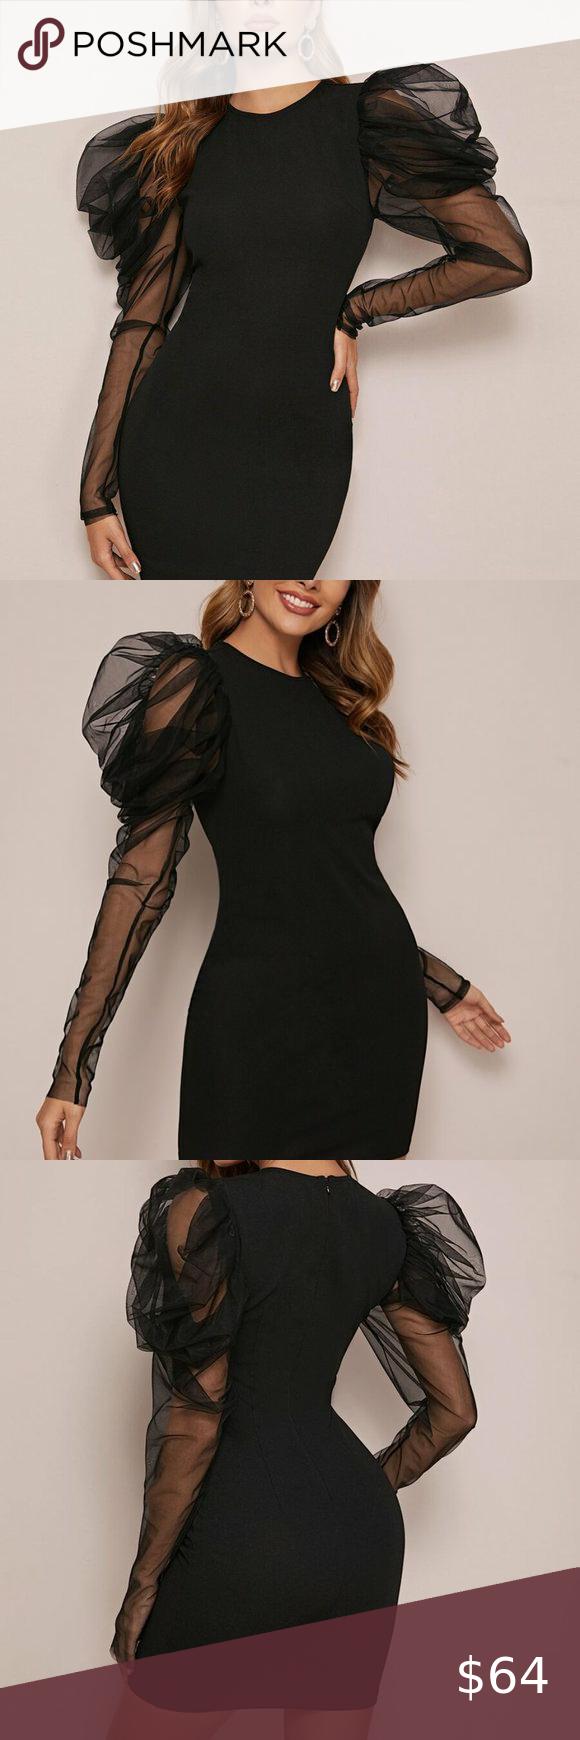 Black Mesh Sleeve Bodycon Mini Dress In 2020 Bodycon Dress With Sleeves Bodycon Mini Dress Necklines For Dresses [ 1740 x 580 Pixel ]